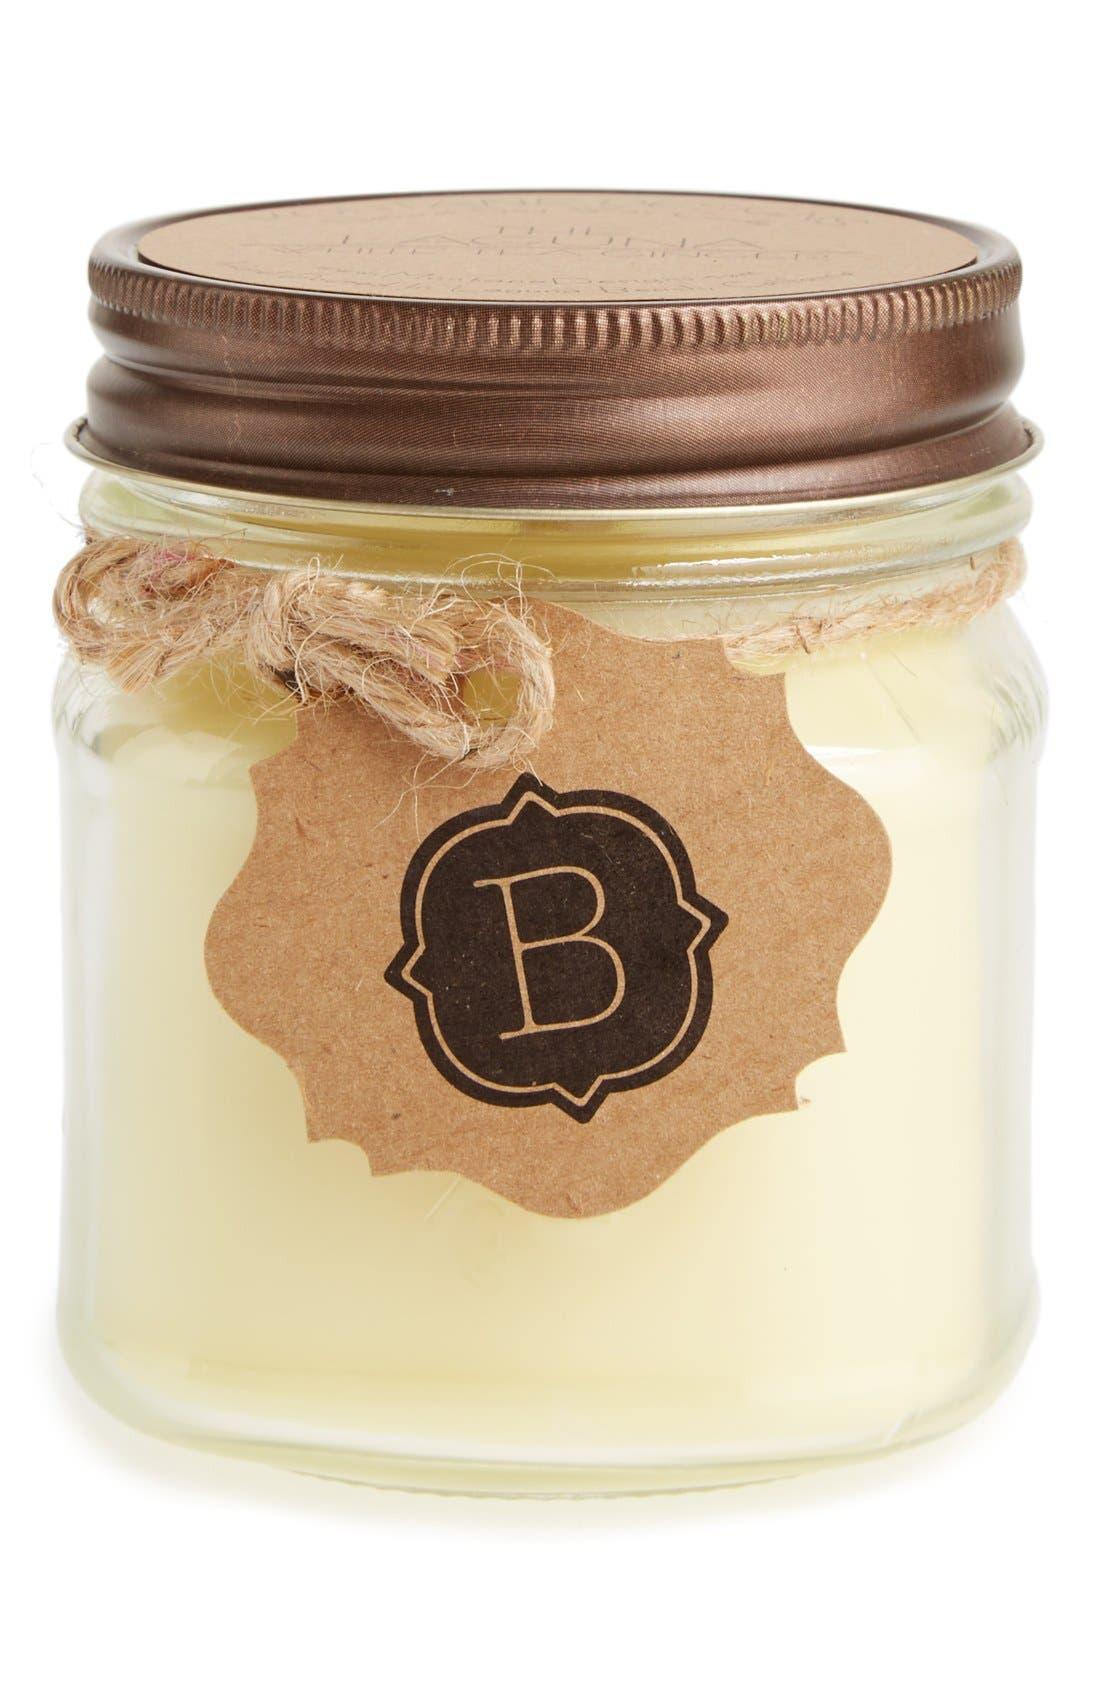 Main Image - Montane Designs Personalized Mini Mason Jar White Tea Ginger Candle